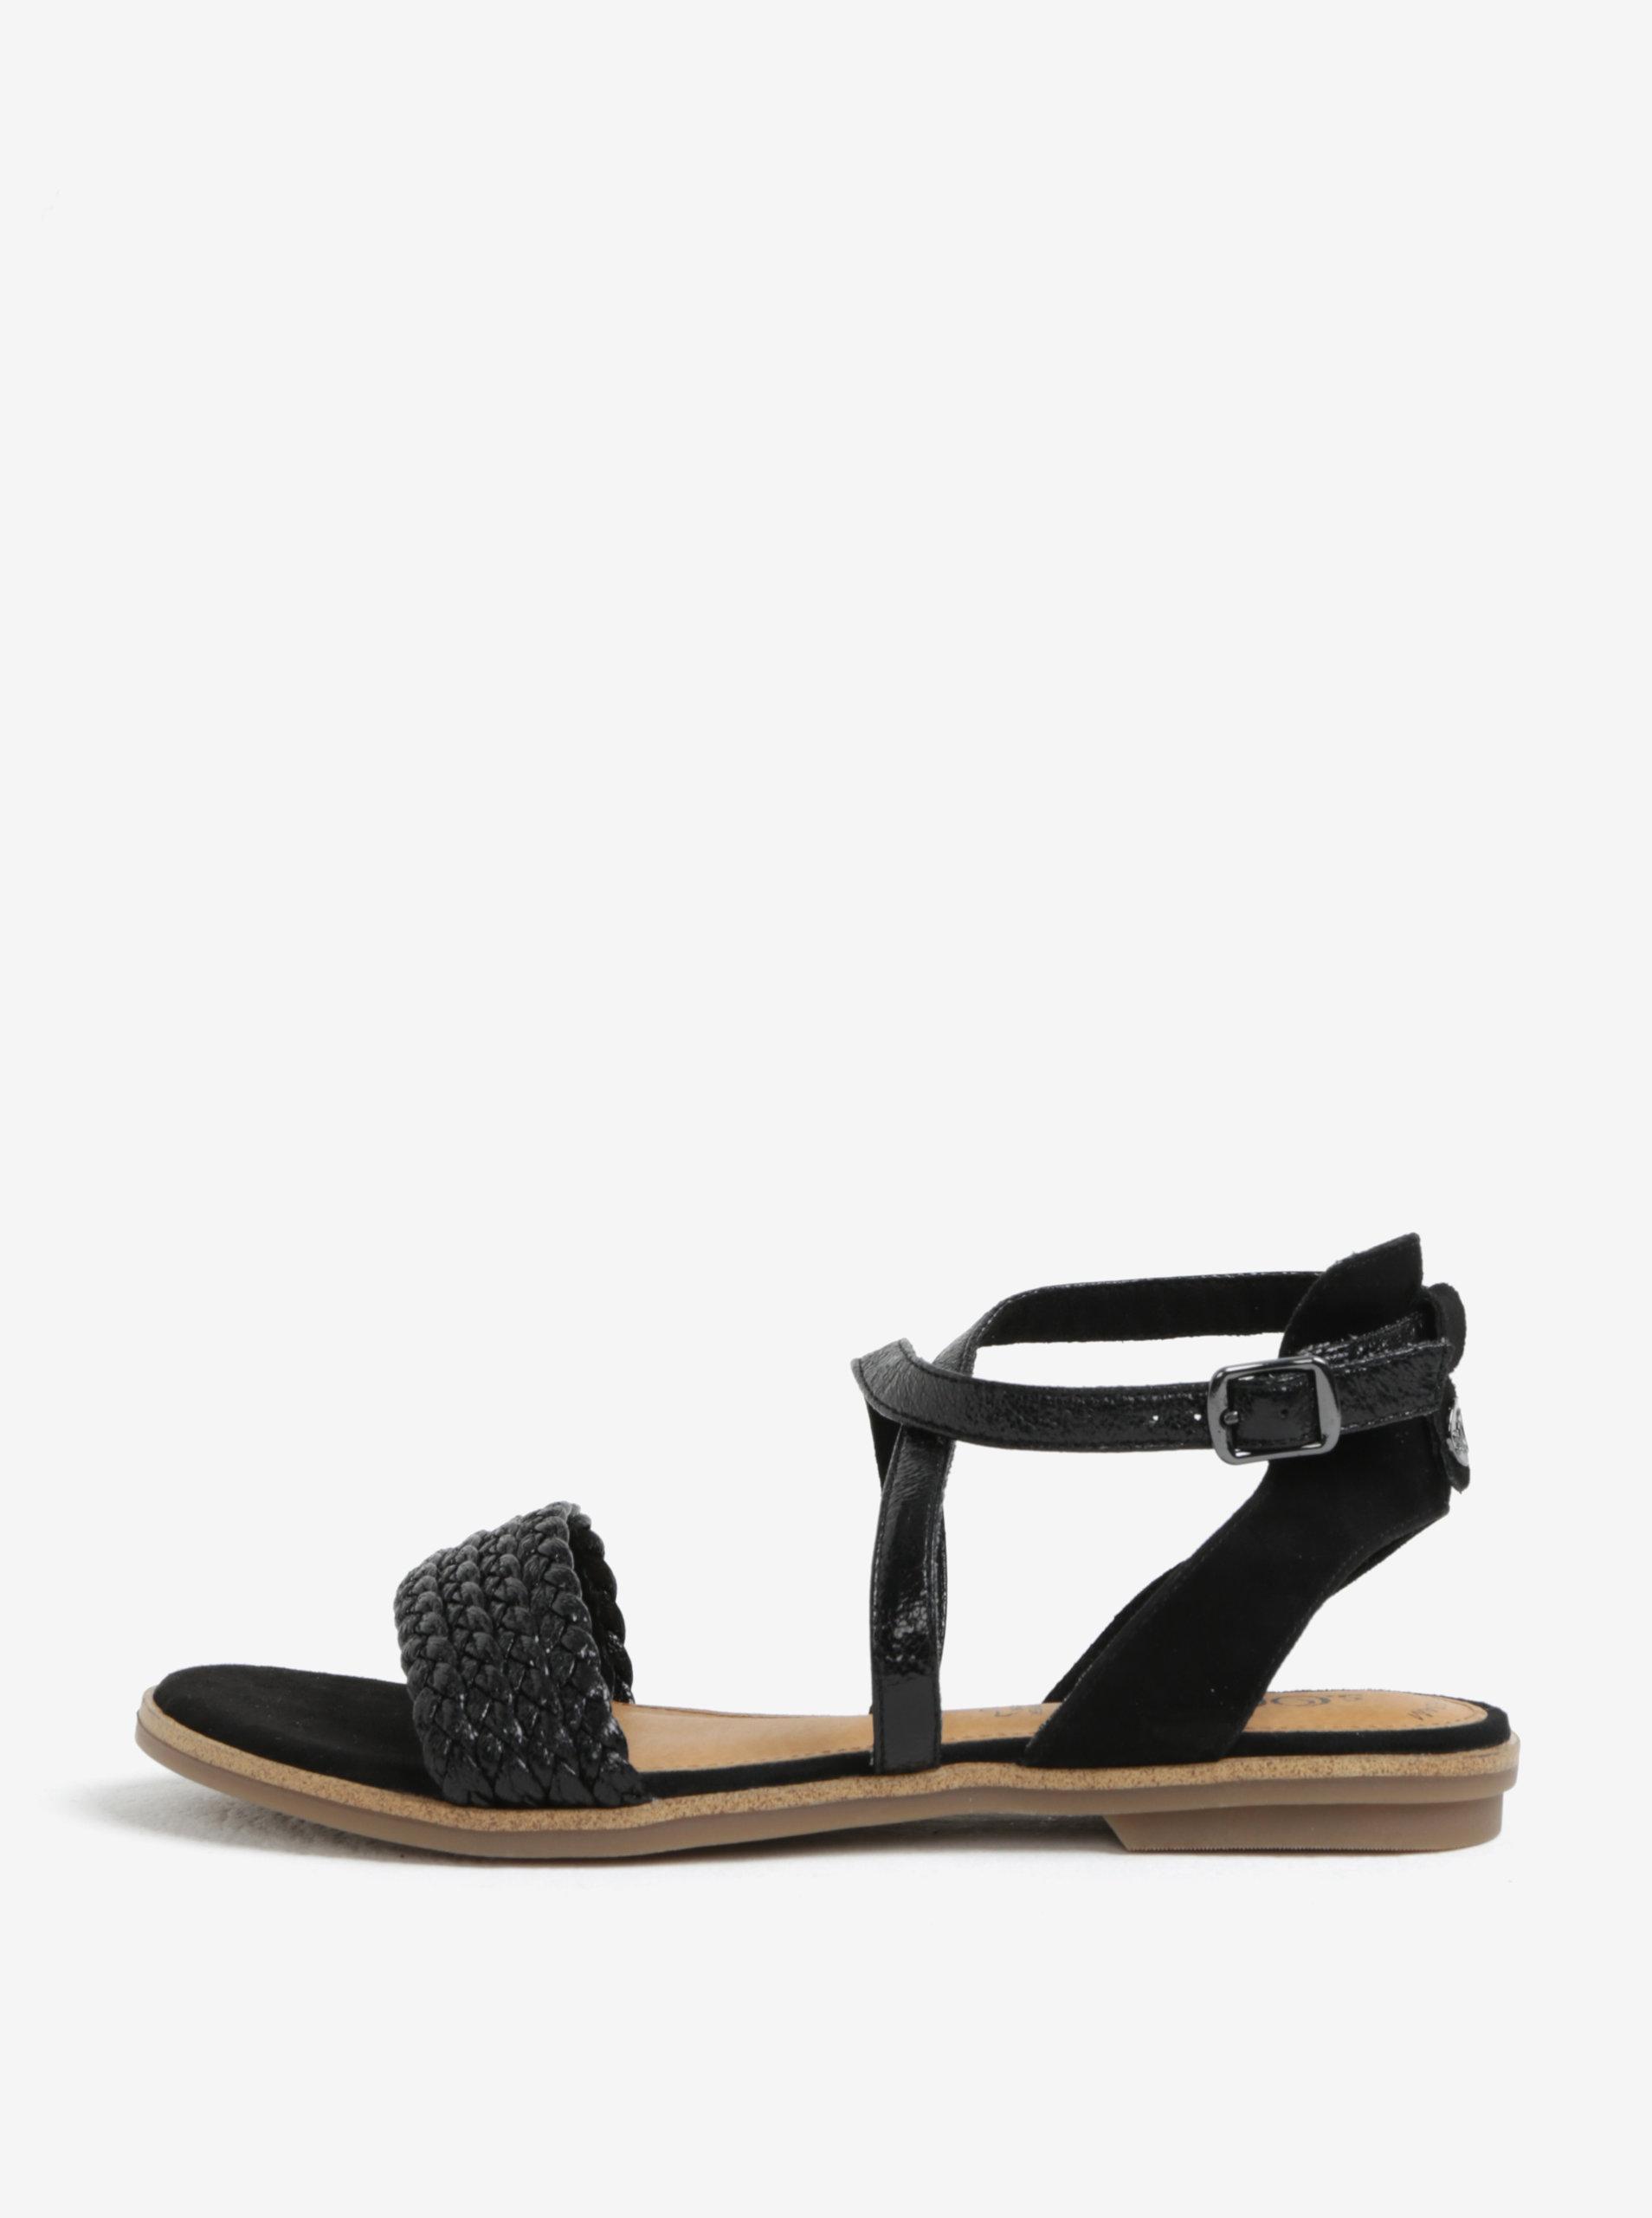 20e7e61268ab Čierne dámske kožené lesklé sandále s.Oliver